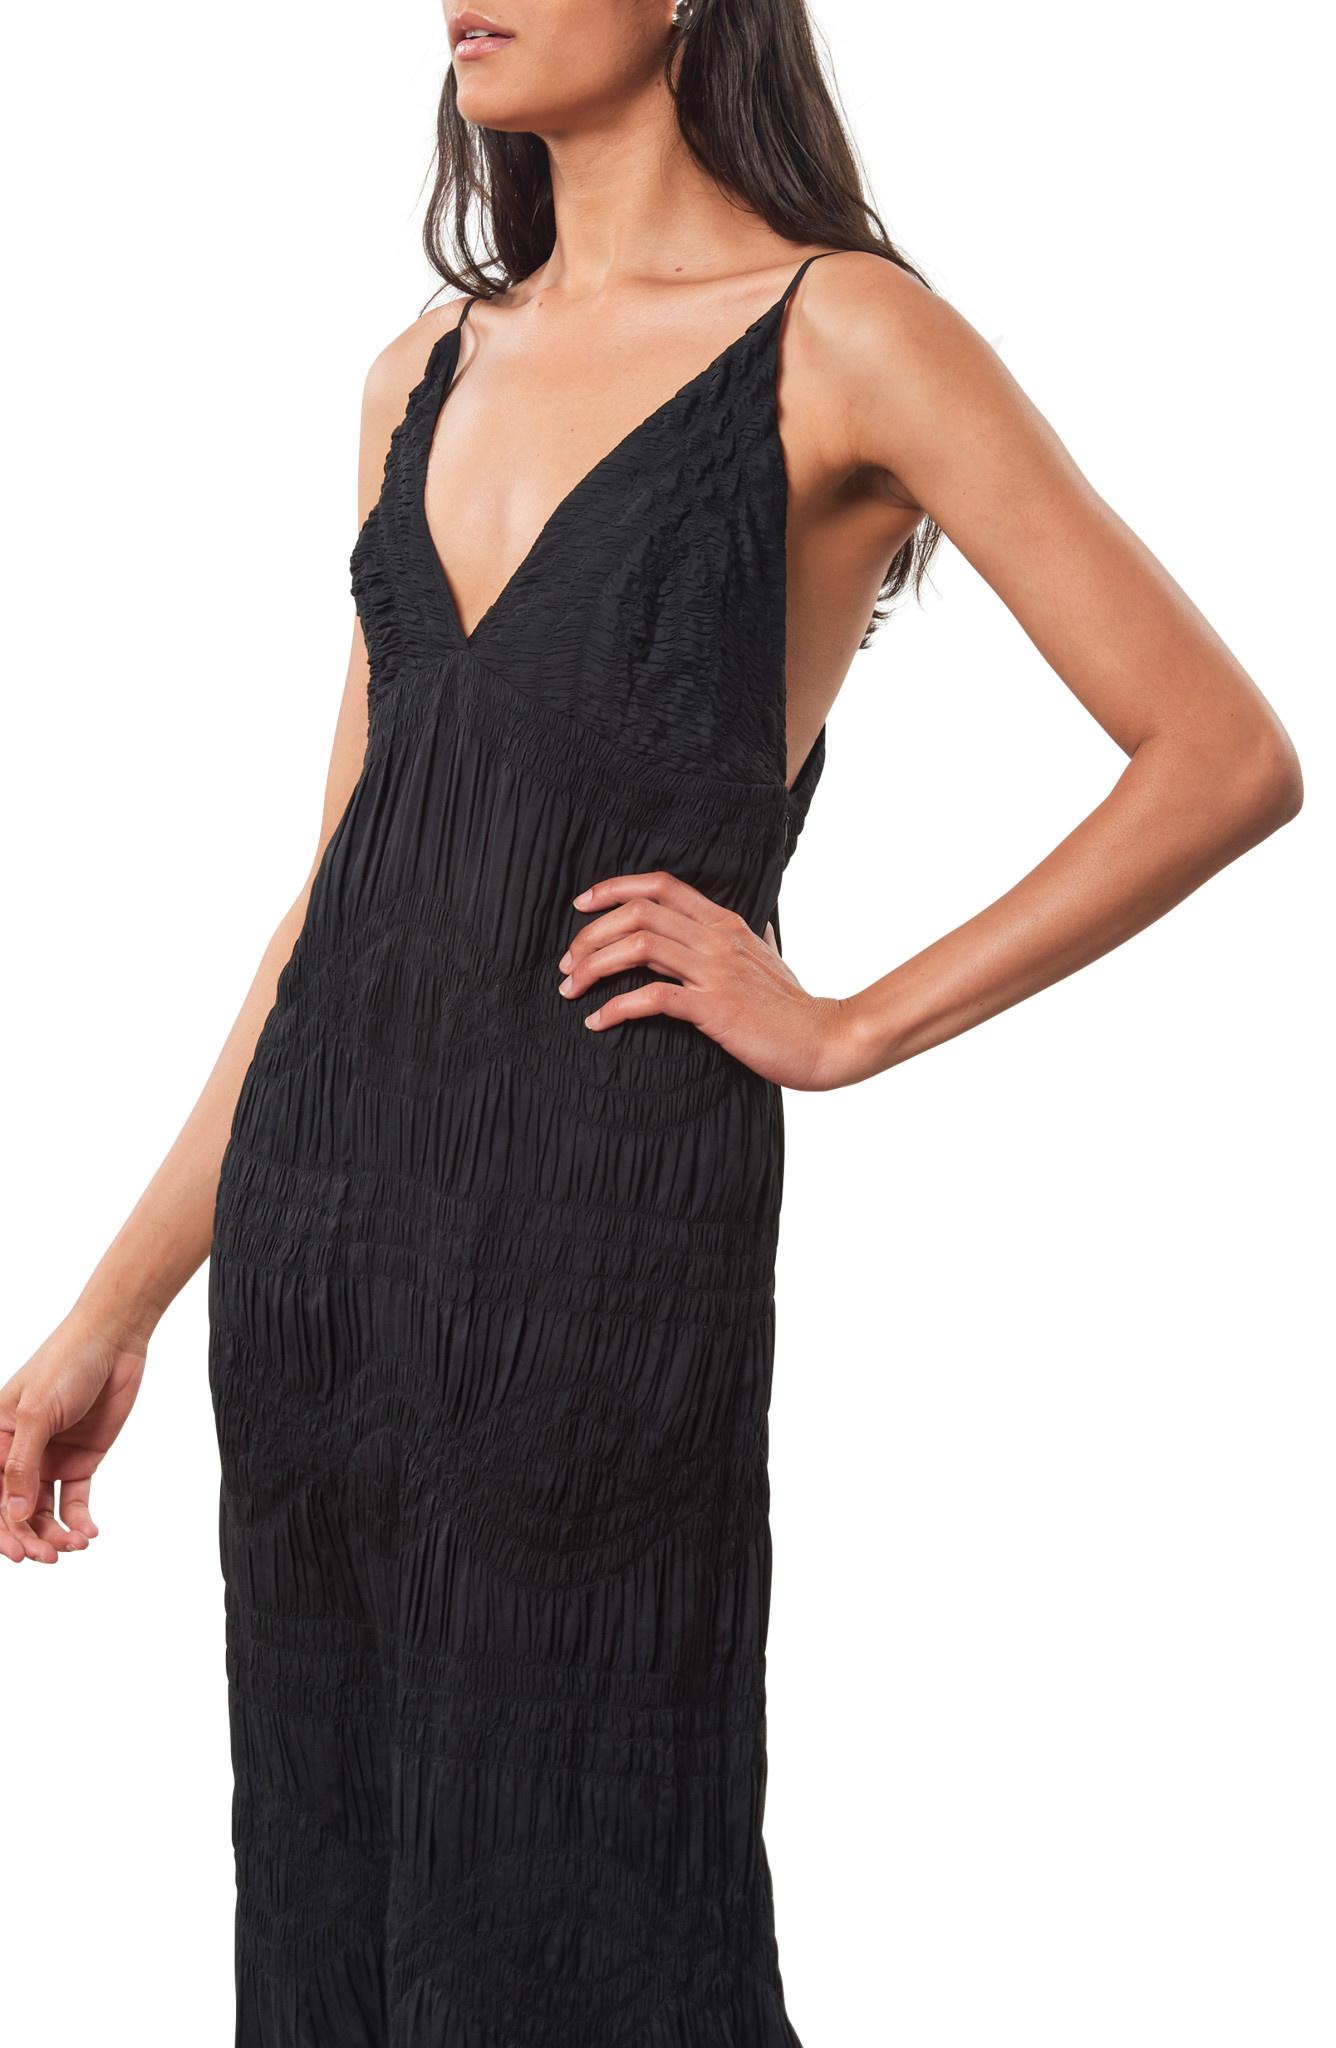 Mara Hoffman Mara Hoffman Keira Dress in Black